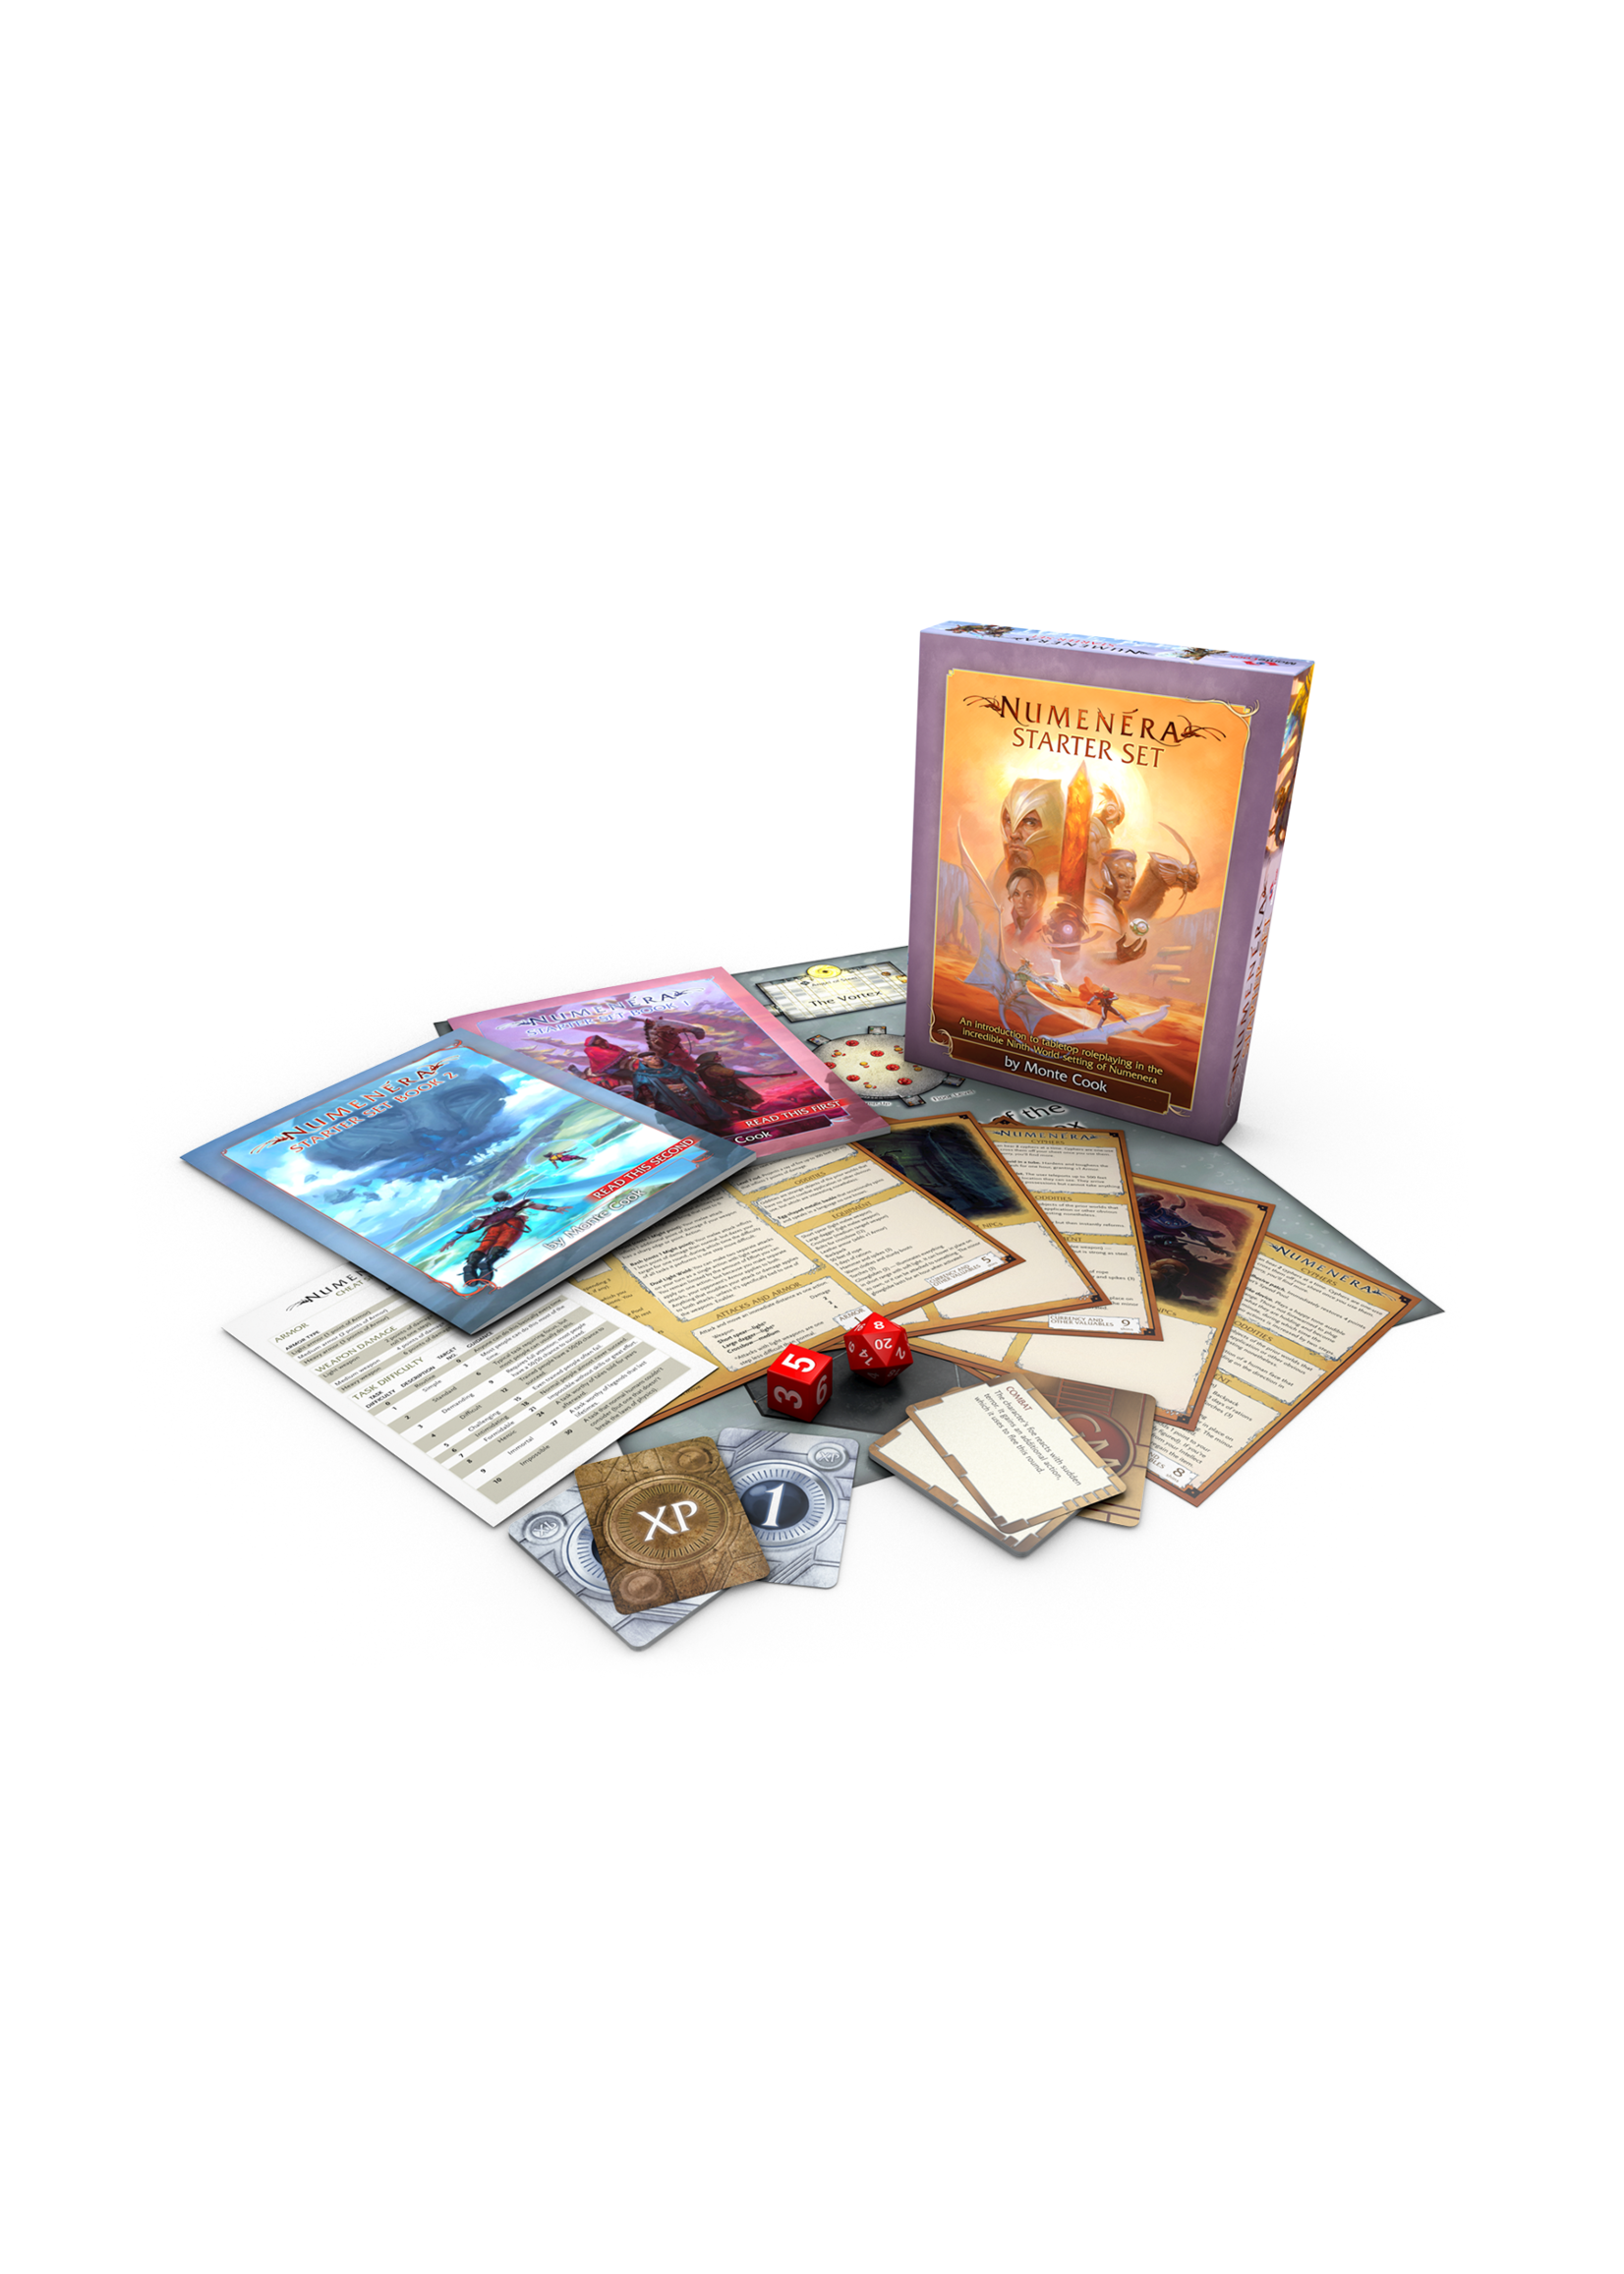 Numenera RPG: Starter Set